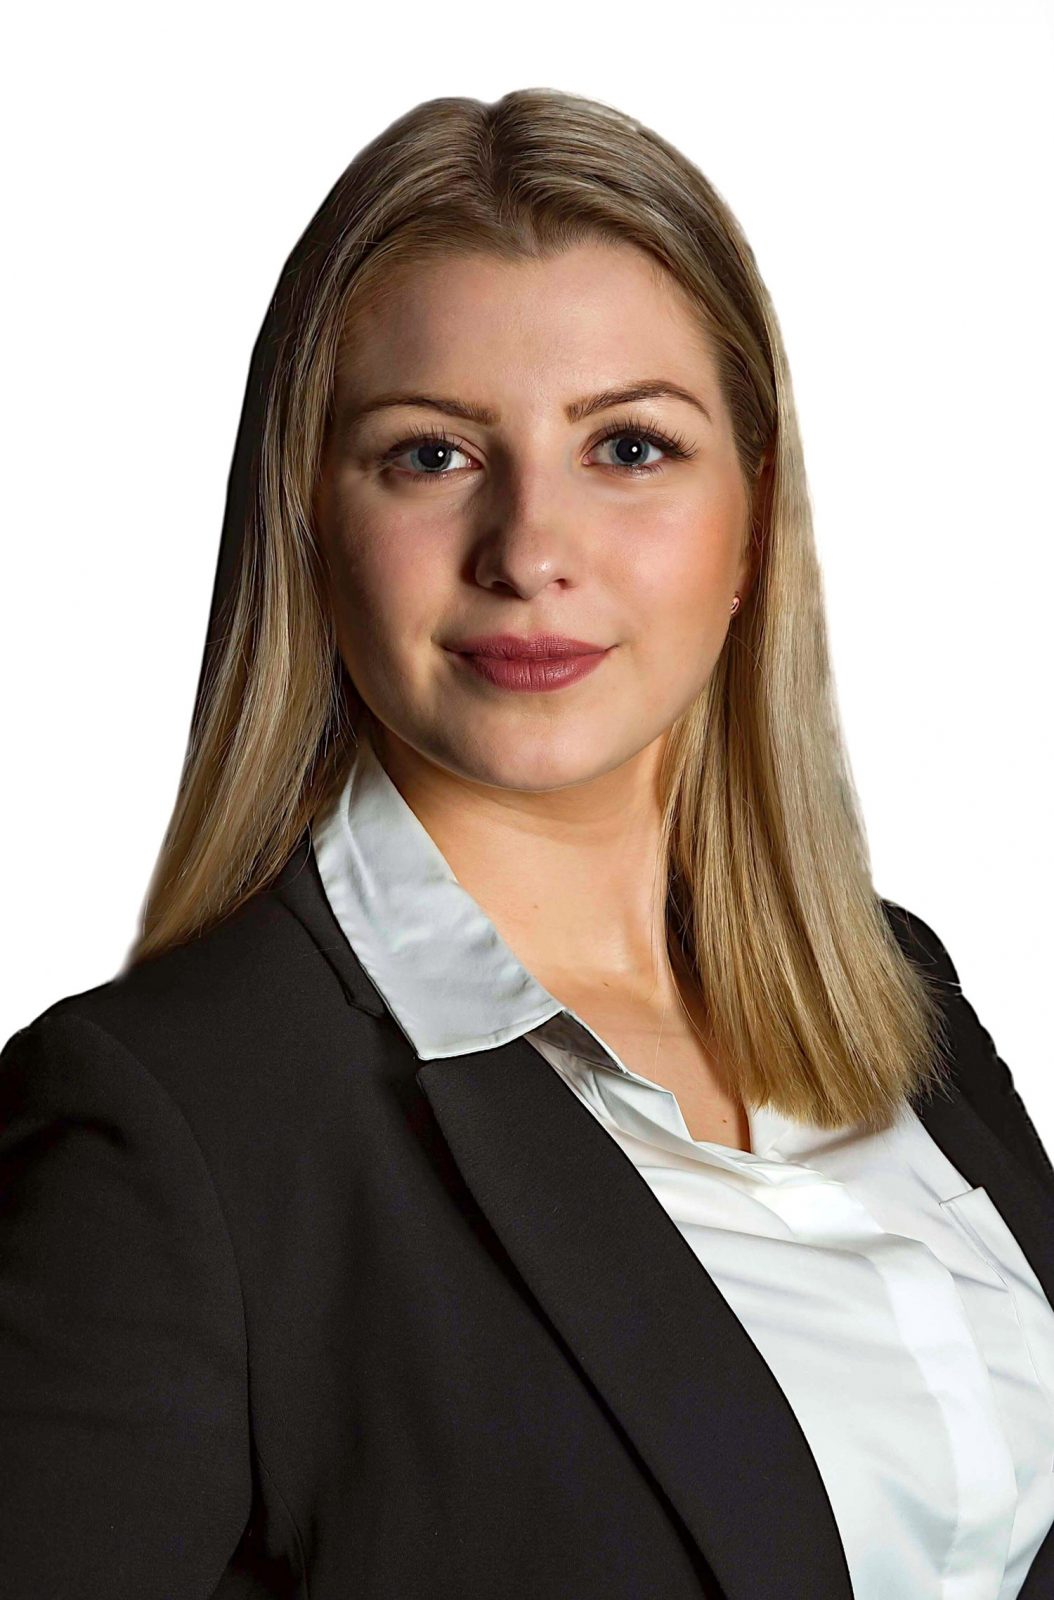 Ine-Mari Martinsen